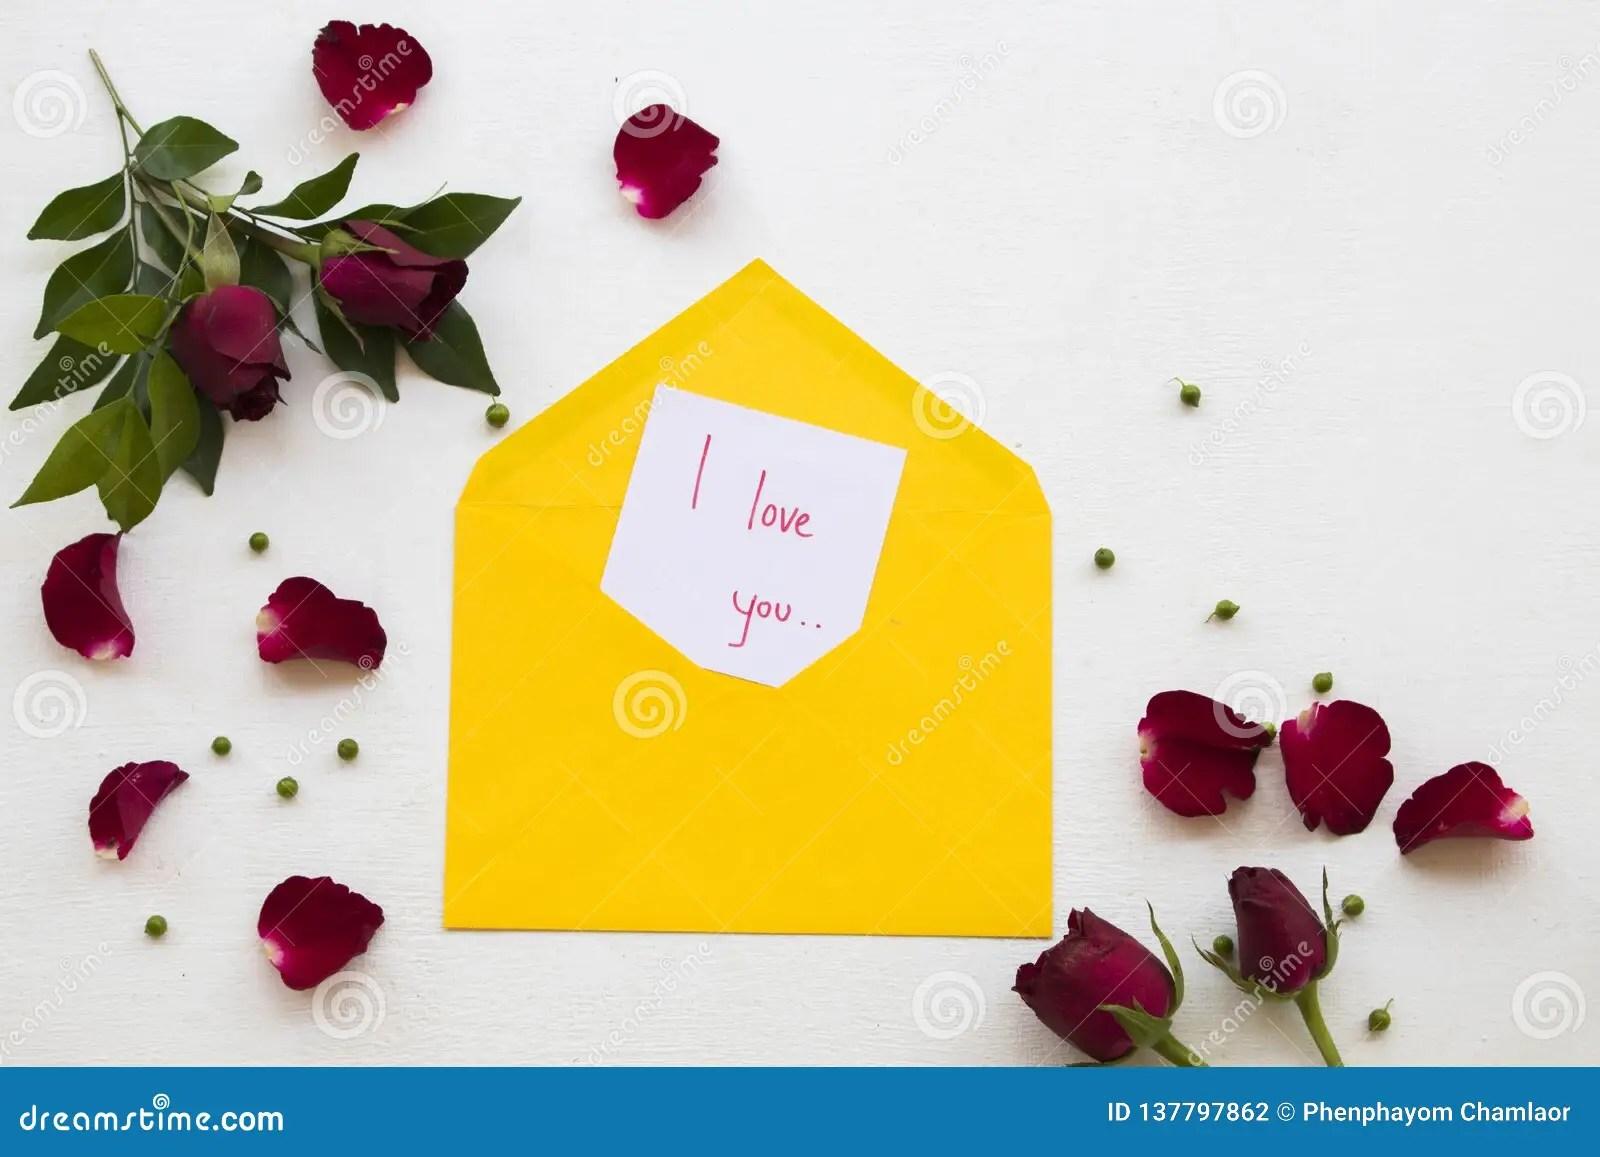 I Love You Message Card Handwriting Postcard Send To